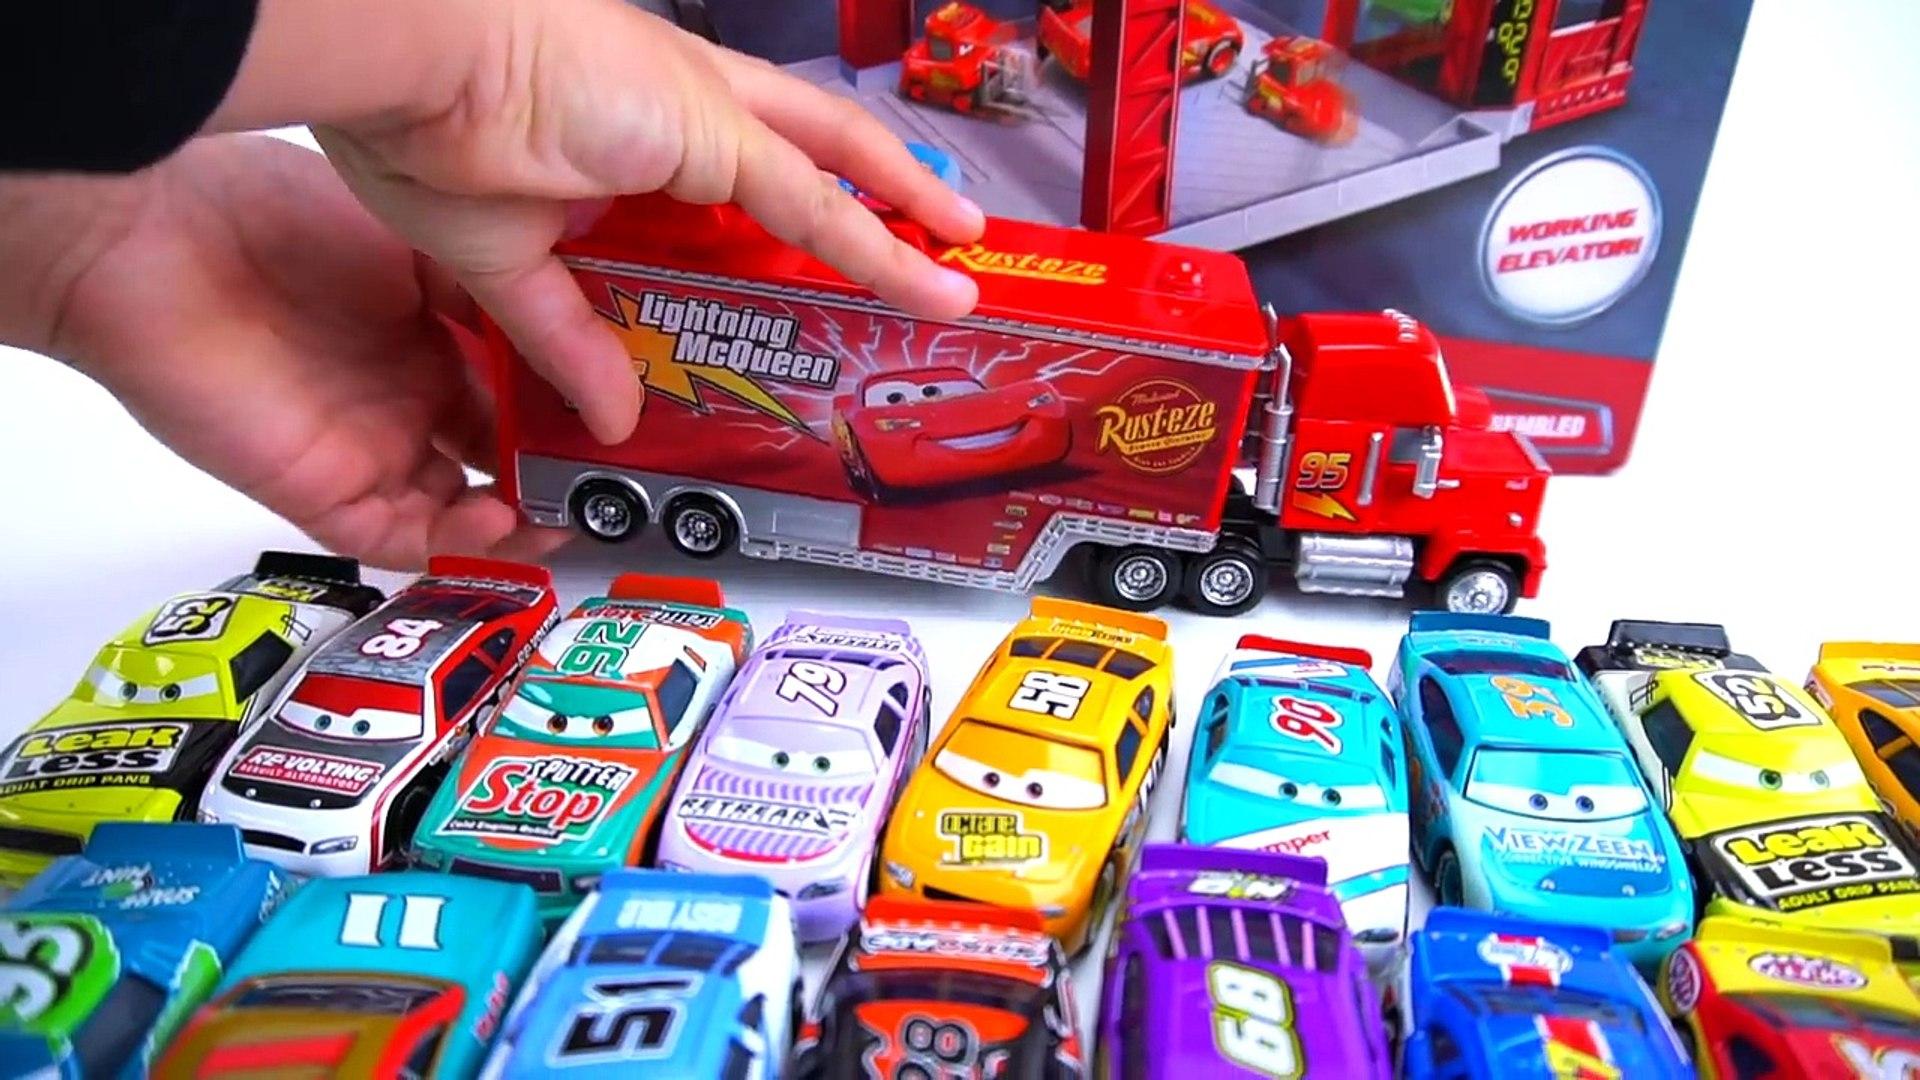 CARS 3 PISTON CUP RACING GARAGE PLAYSET TOY